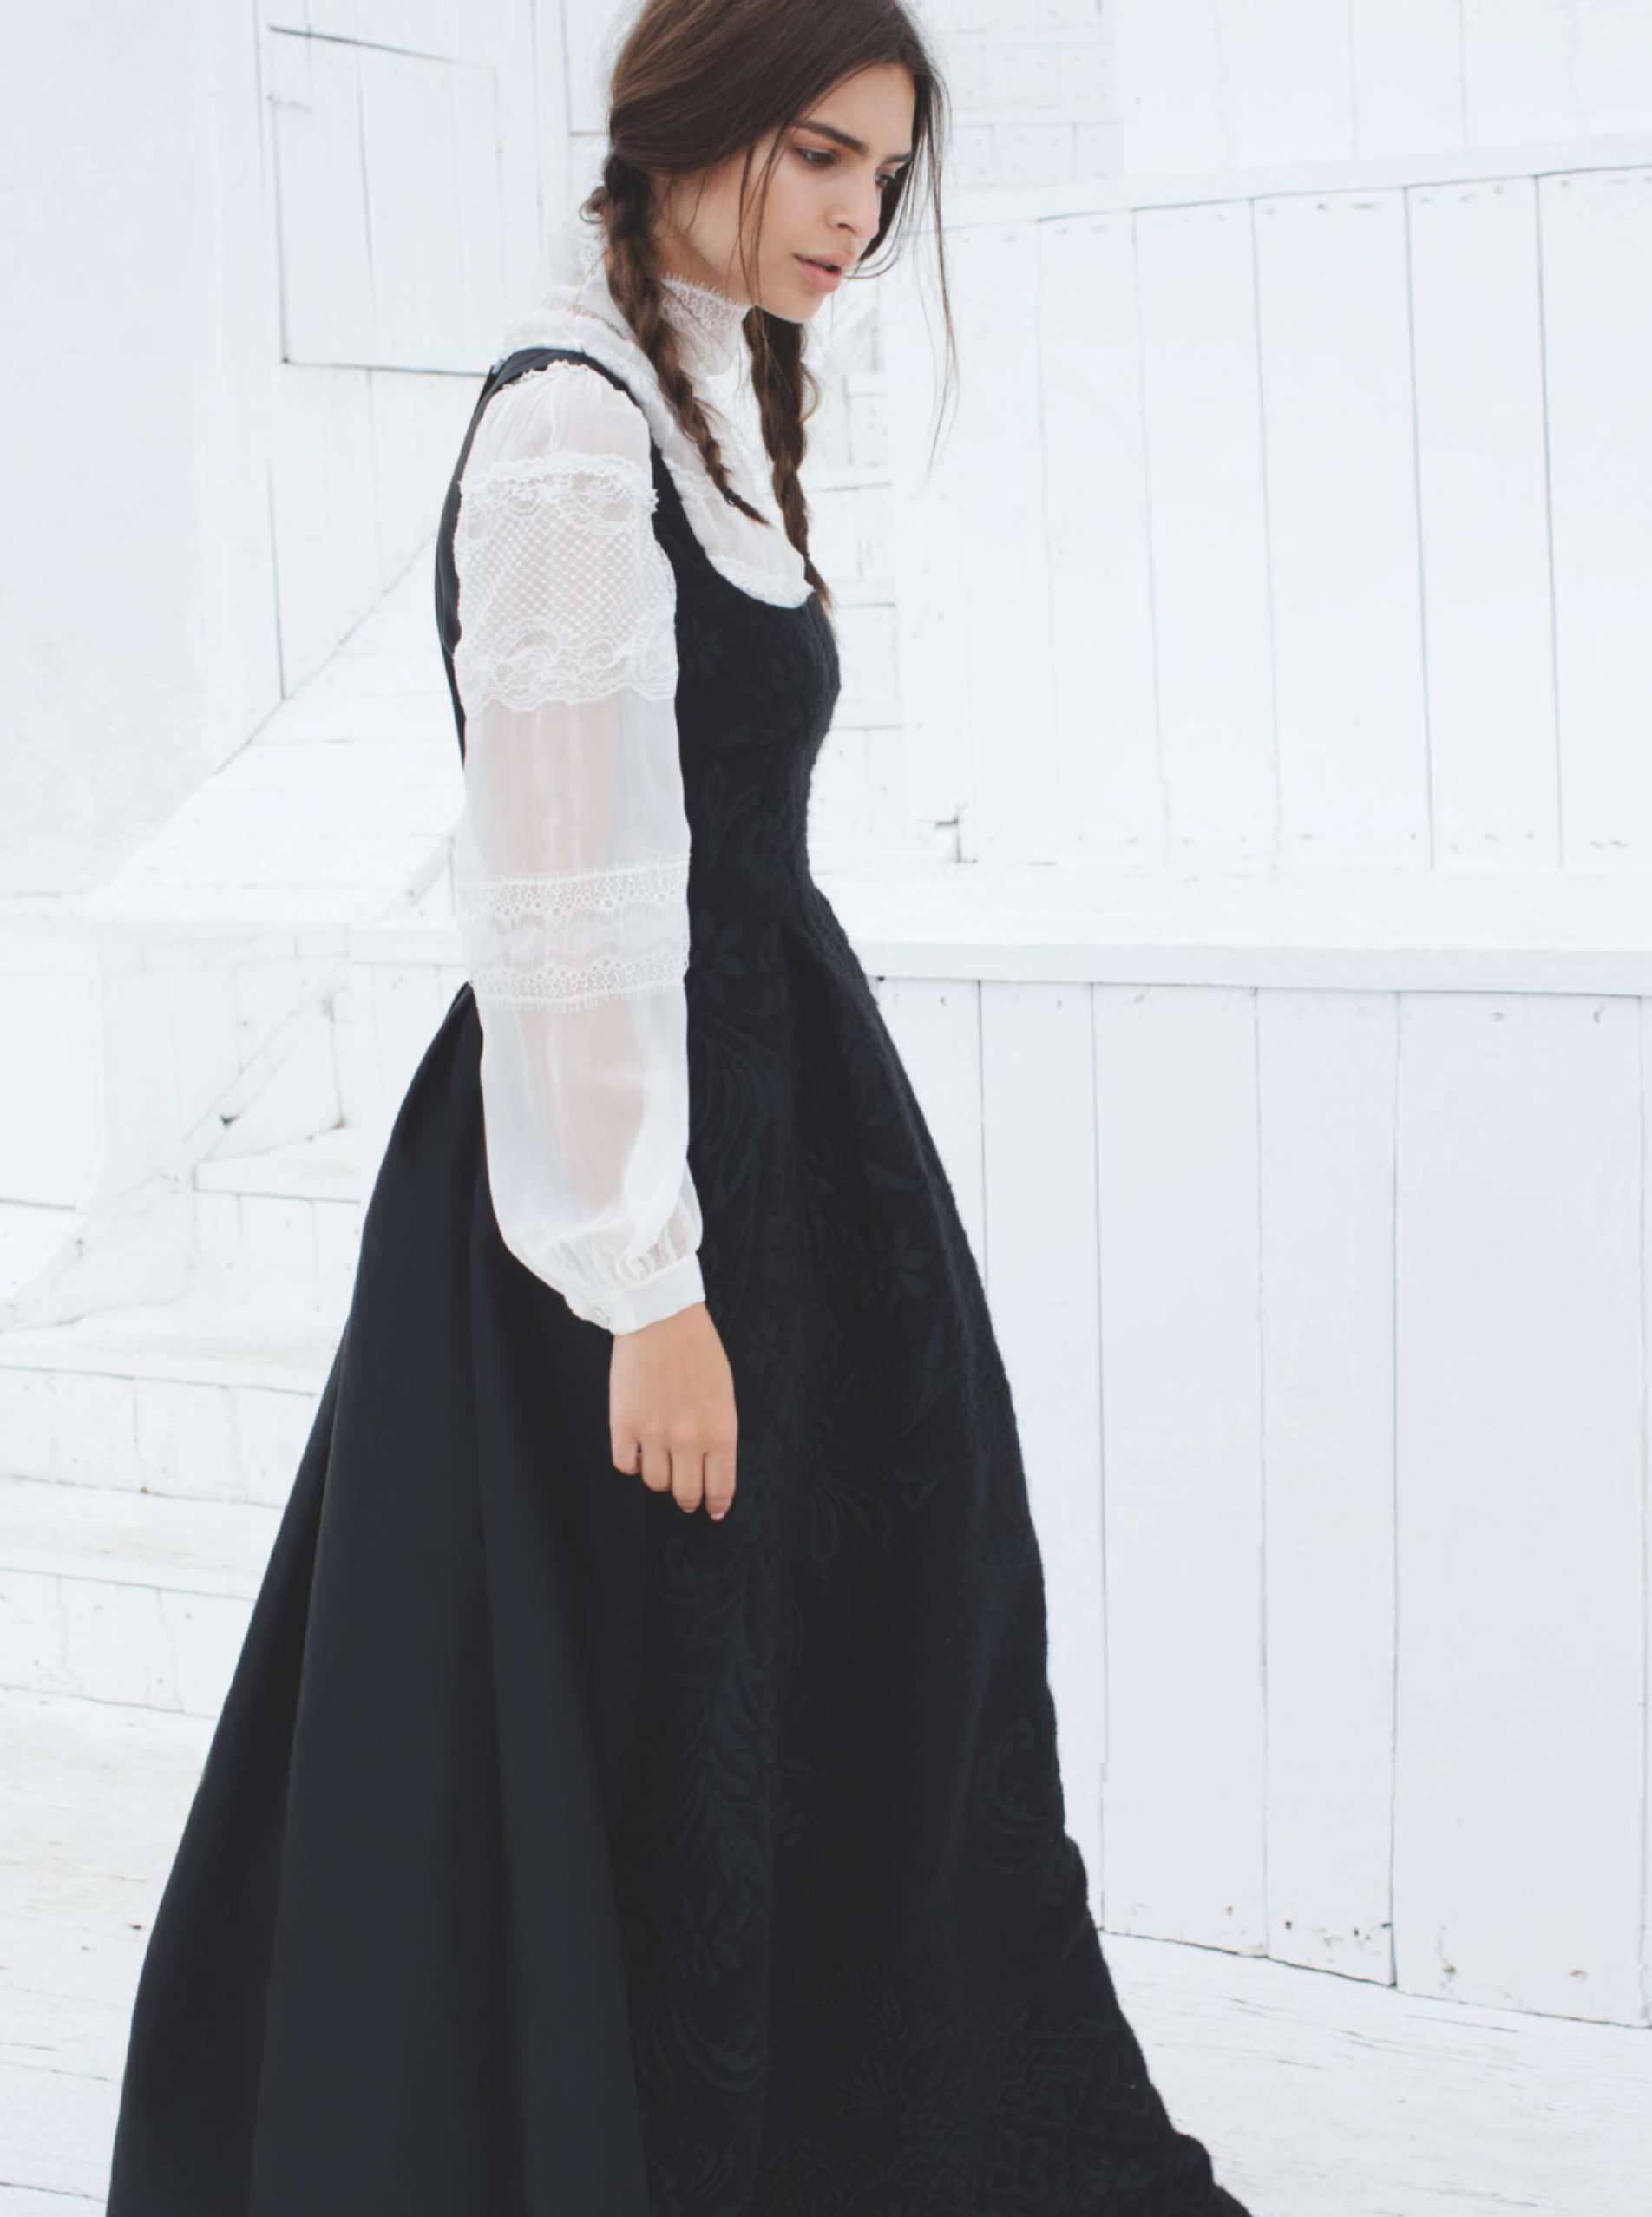 Dress, 1,560, and blouse, 780, both Alberta Ferretti